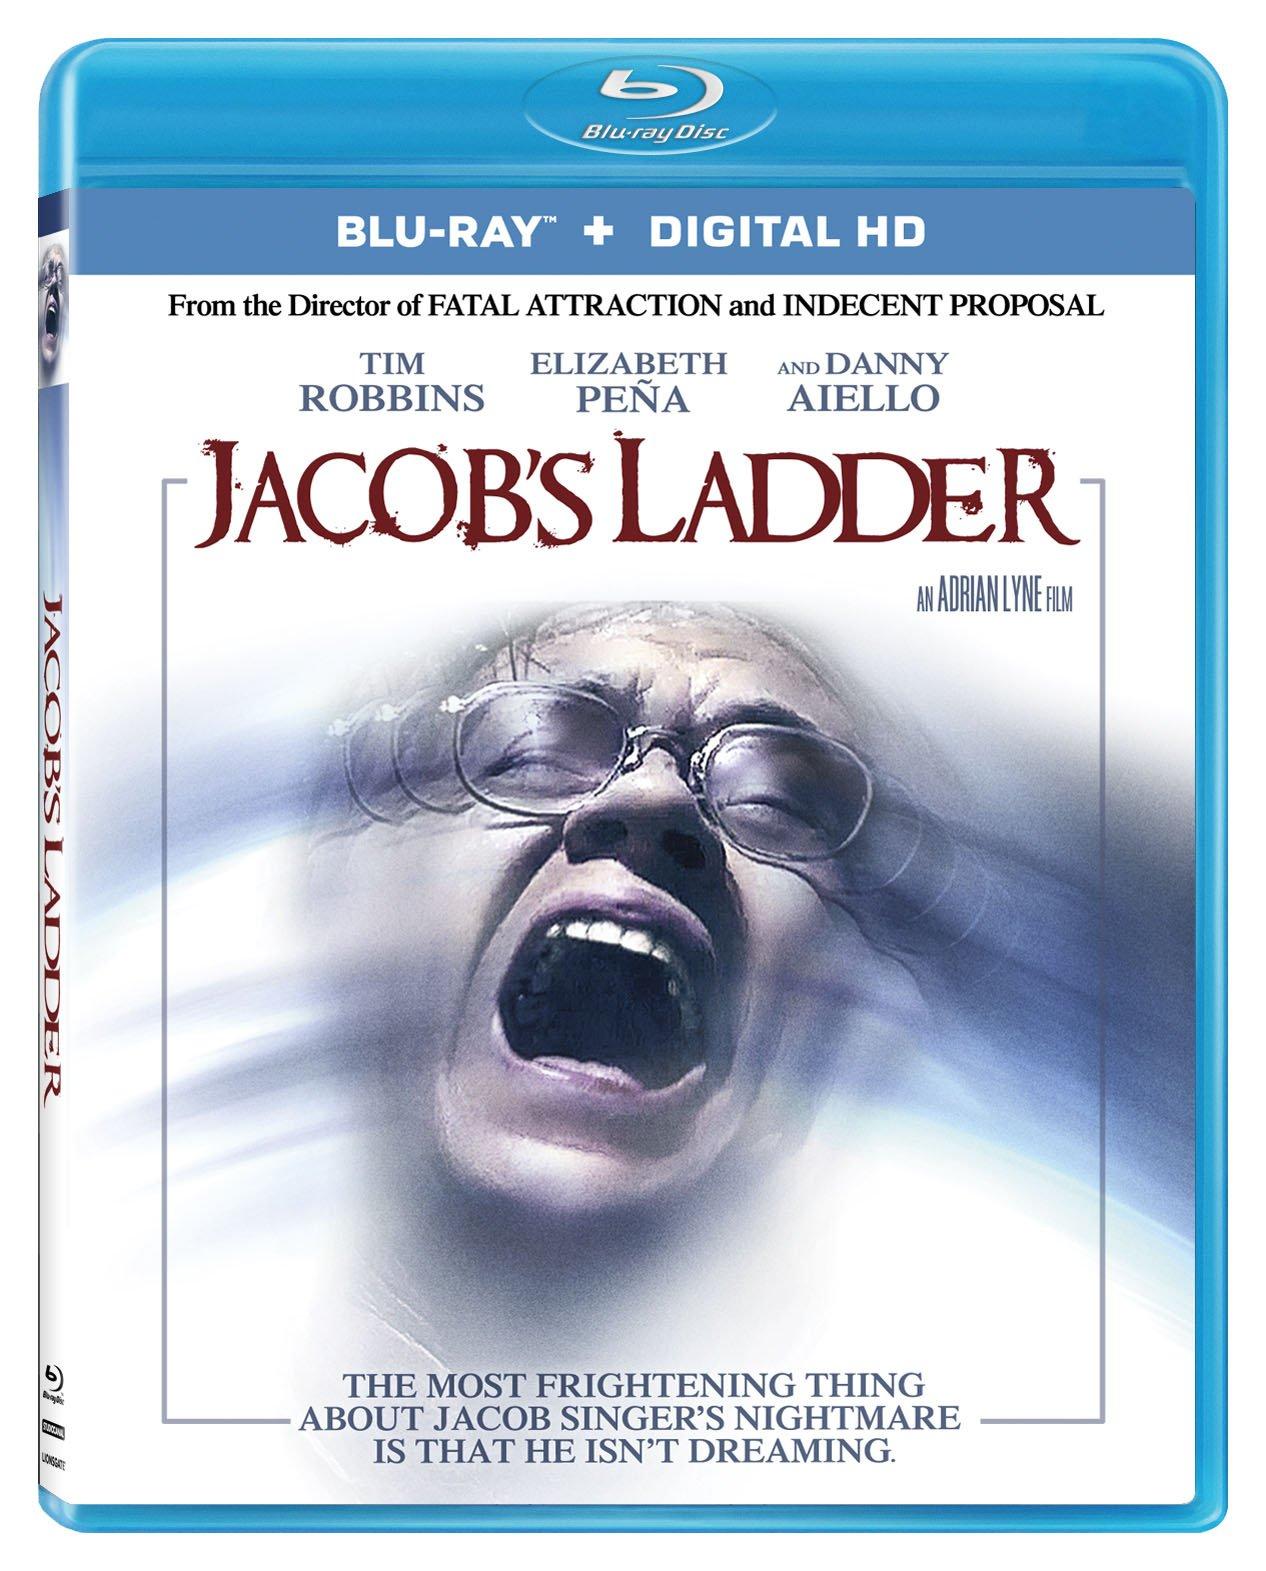 Blu-ray : Jacob's Ladder (Blu-ray)